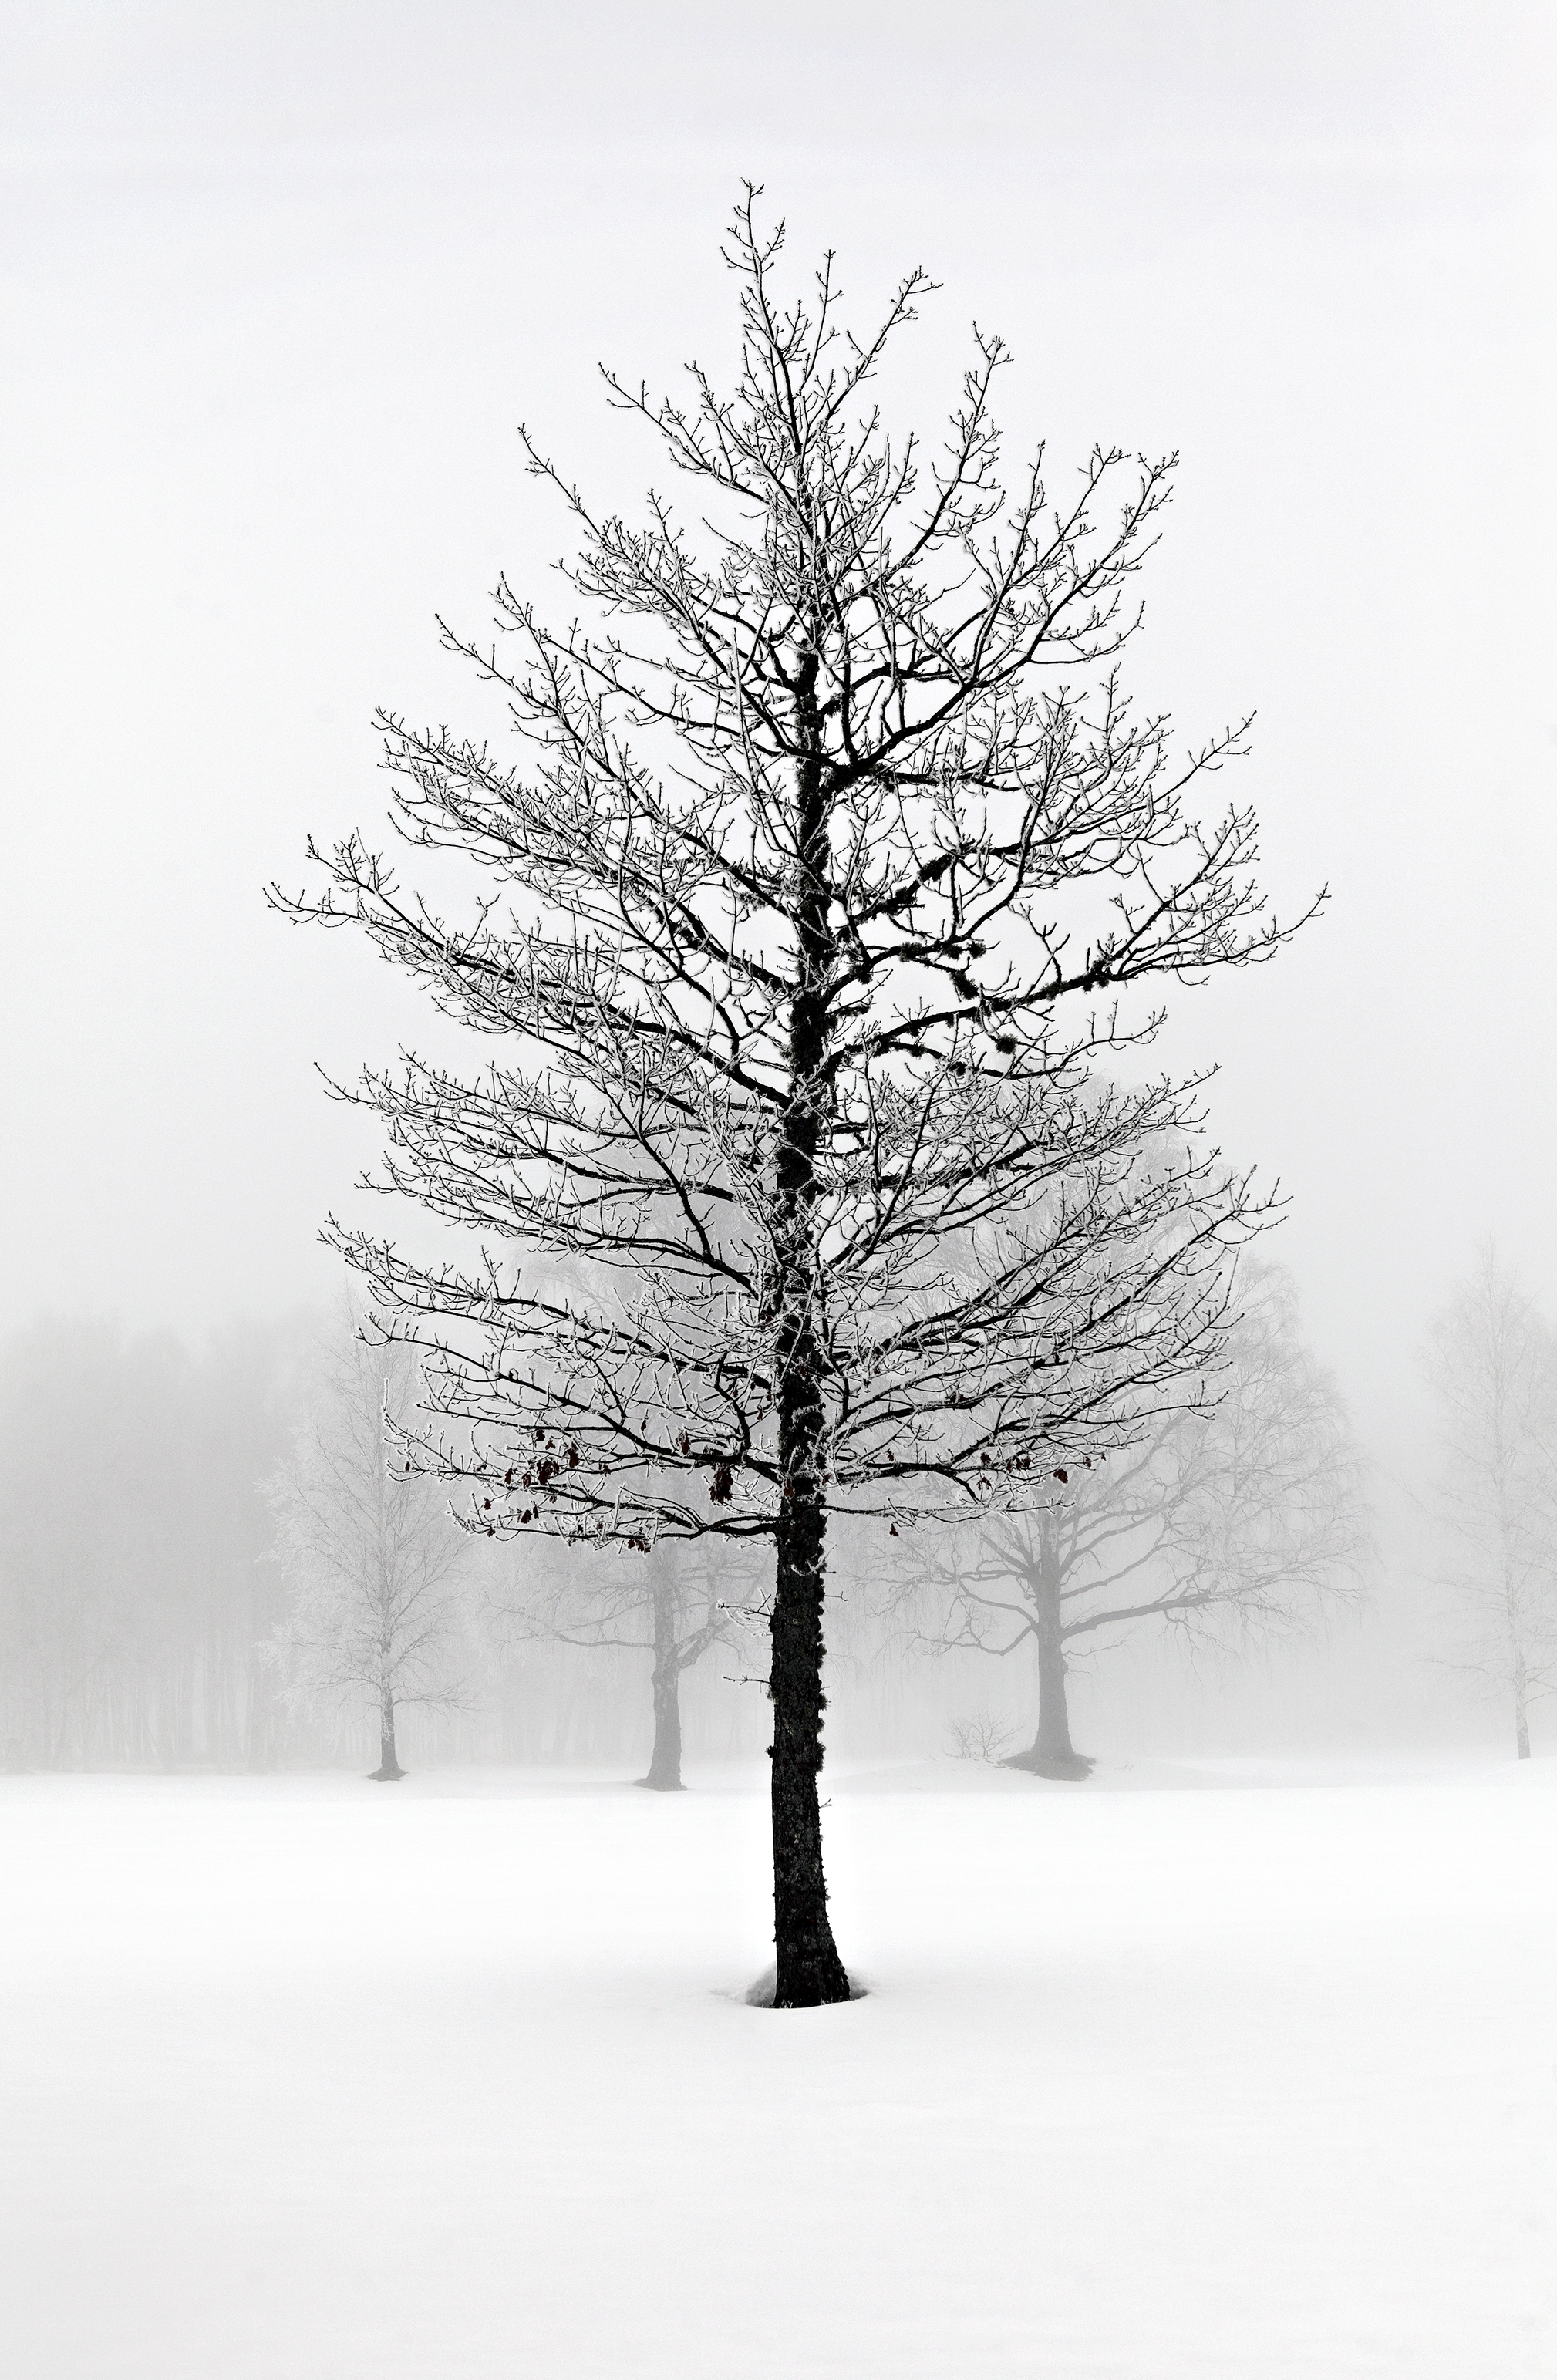 Winter Mist 1 # 2